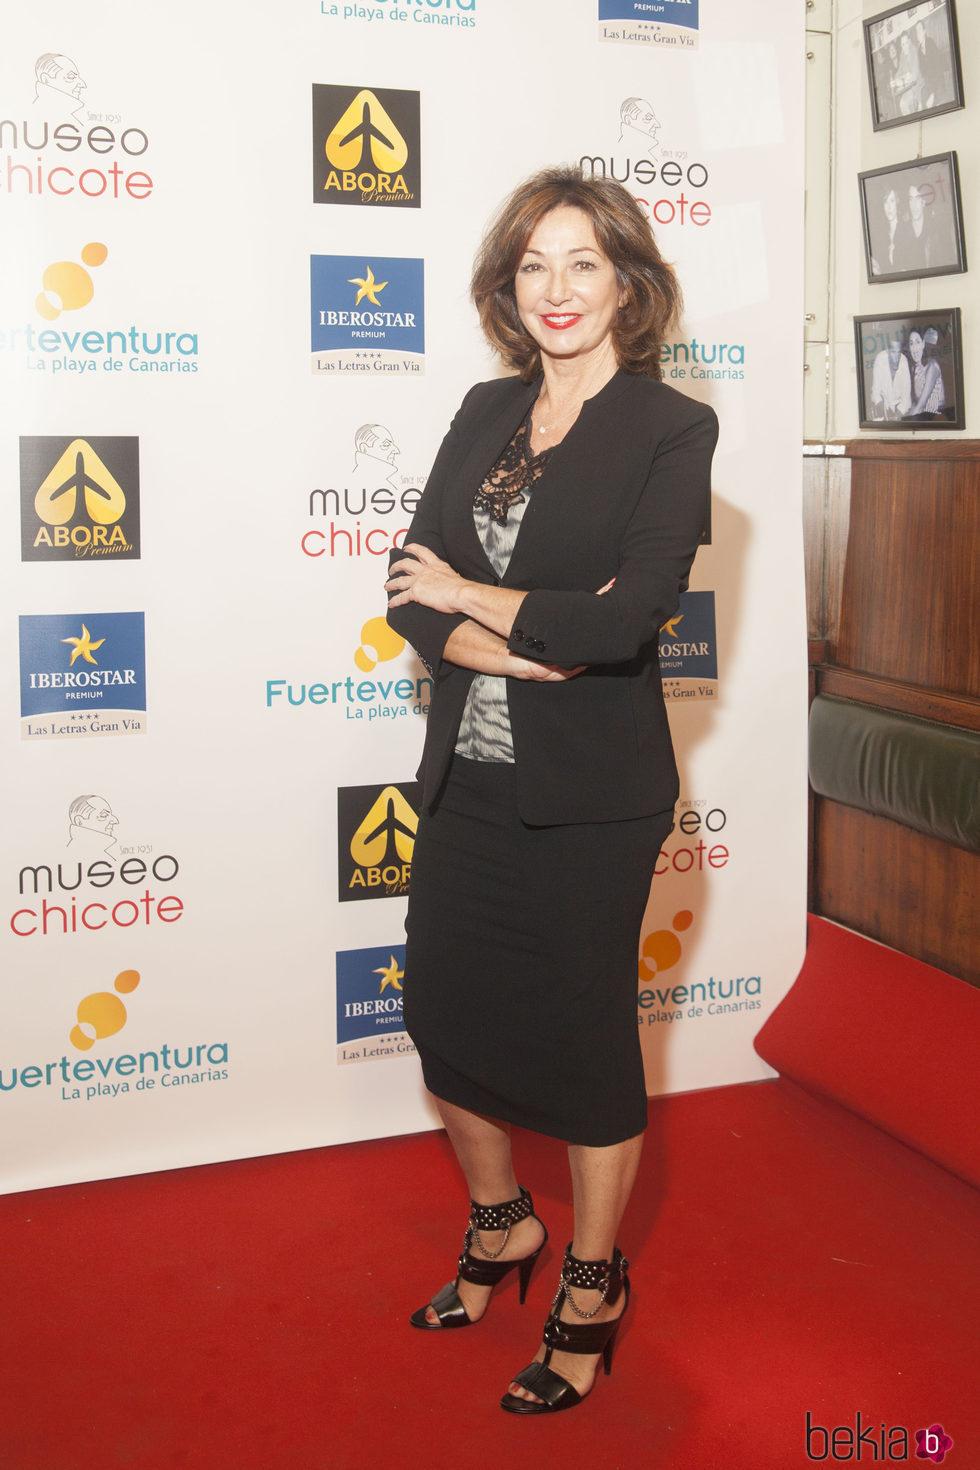 Ana Rosa Quintana en los Premios Chicote 2016 - Famosos.